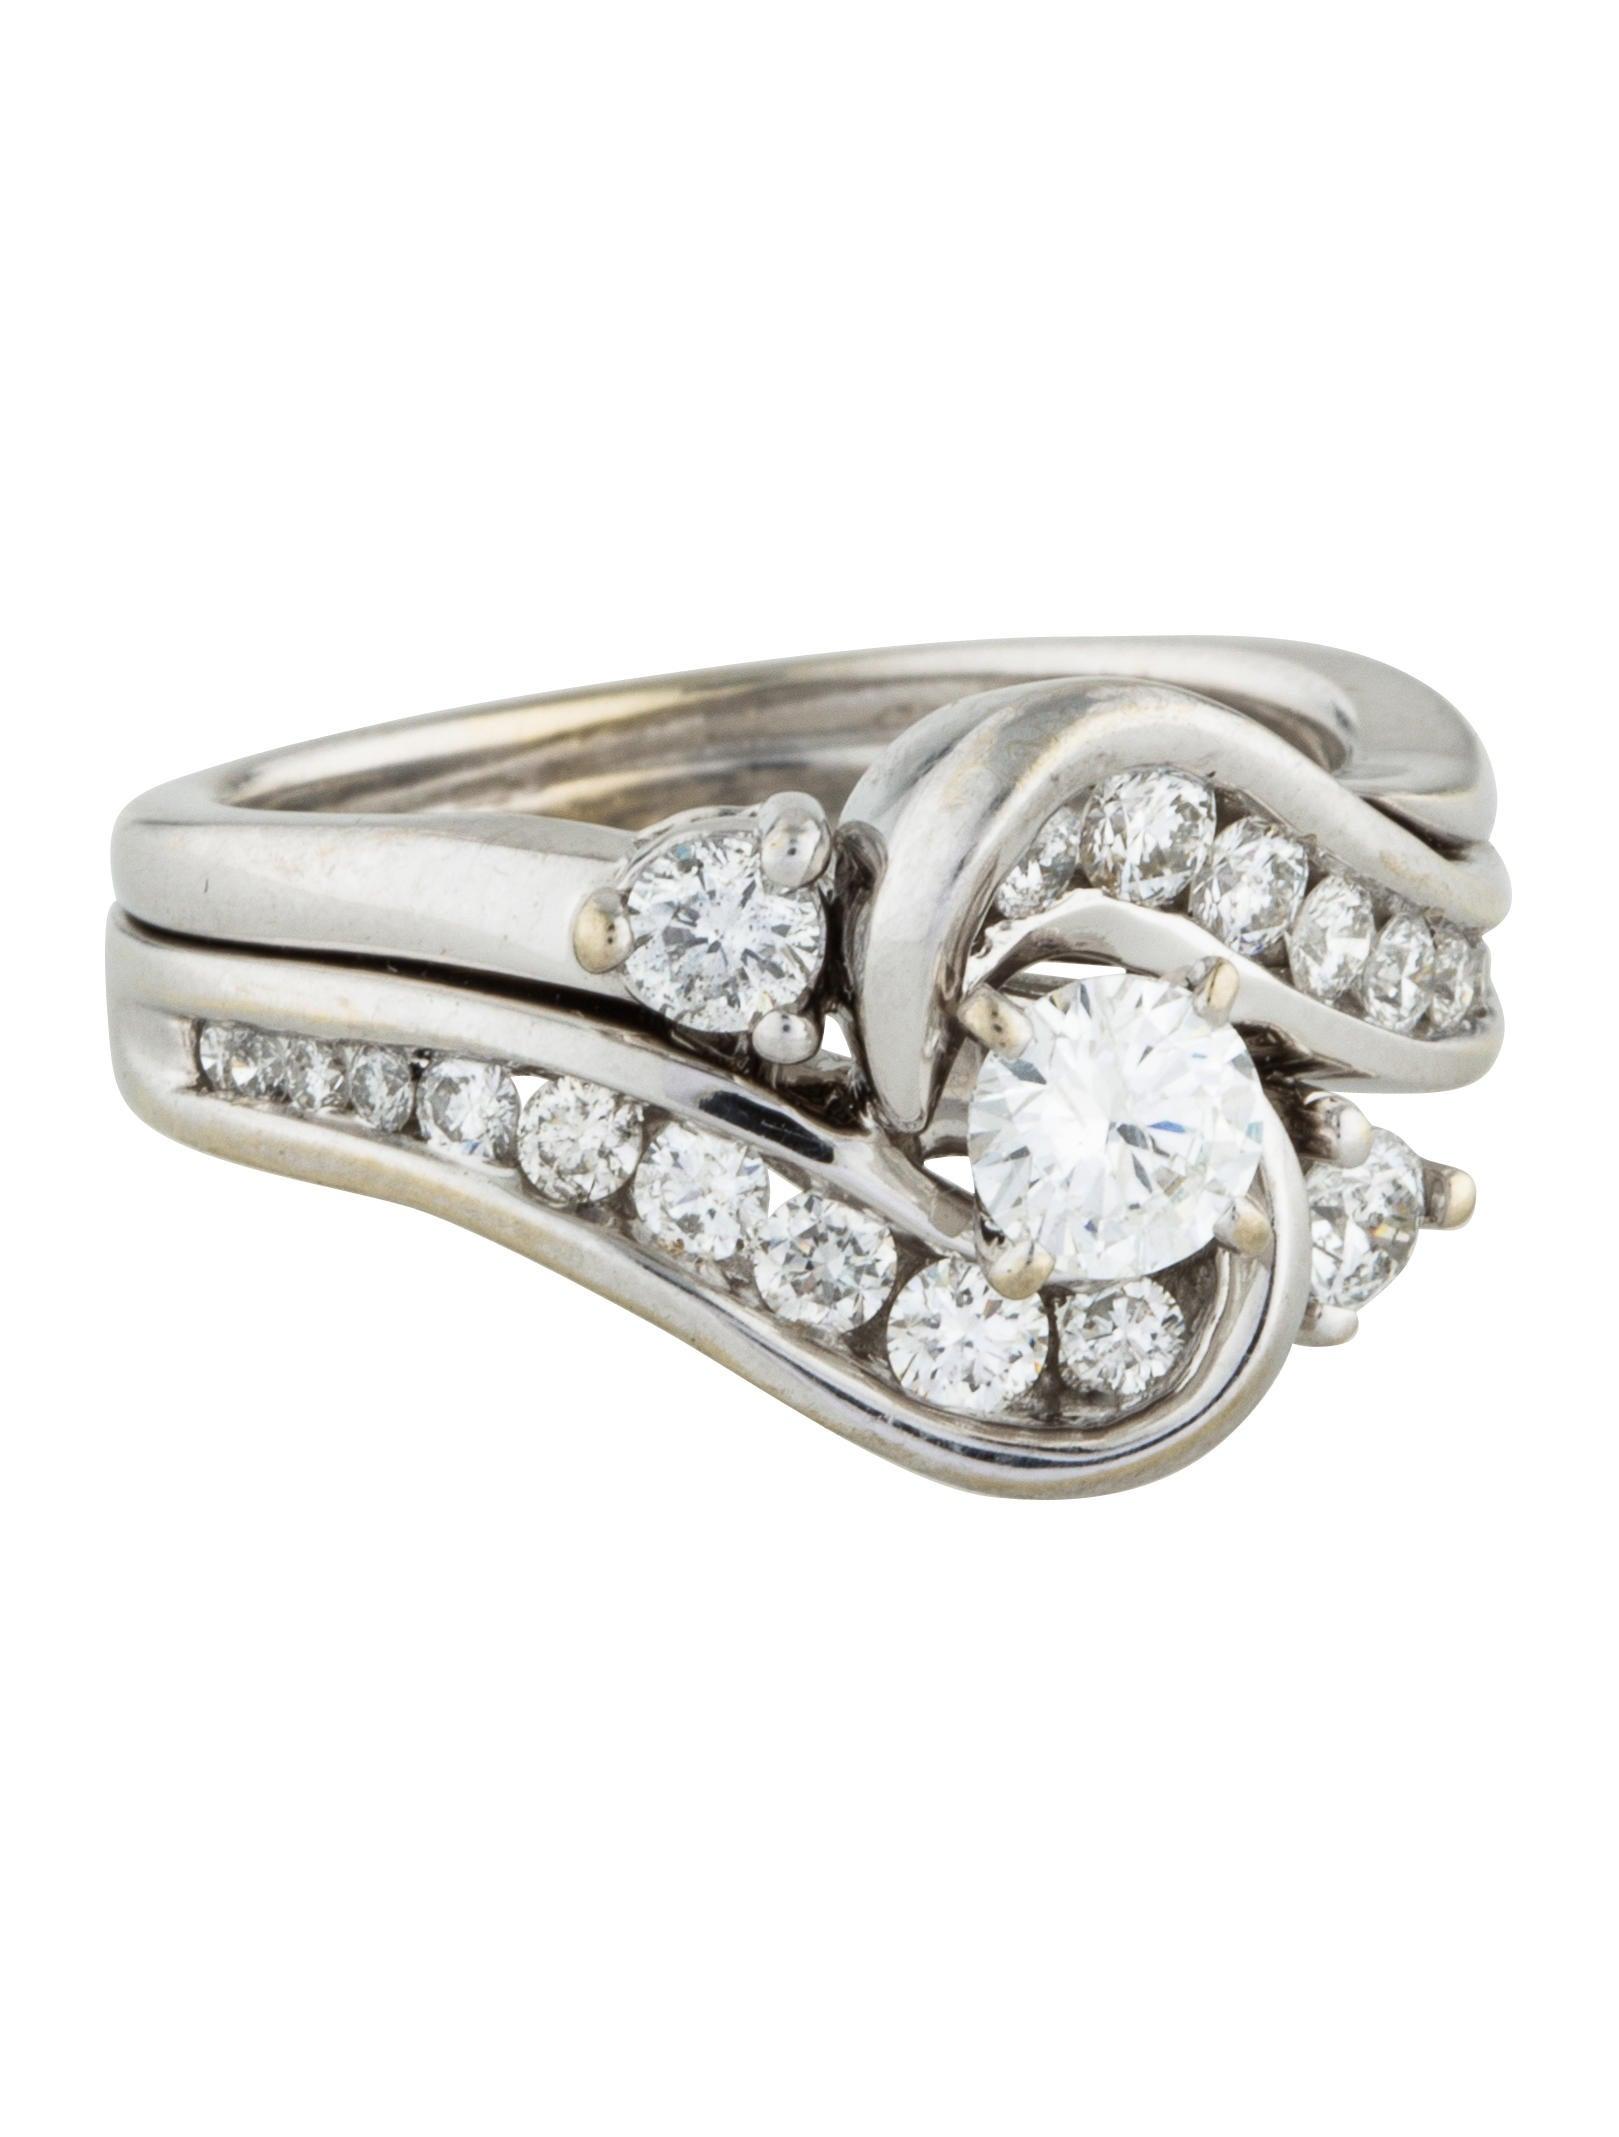 14k diamond cluster engagement ring rings engri20732